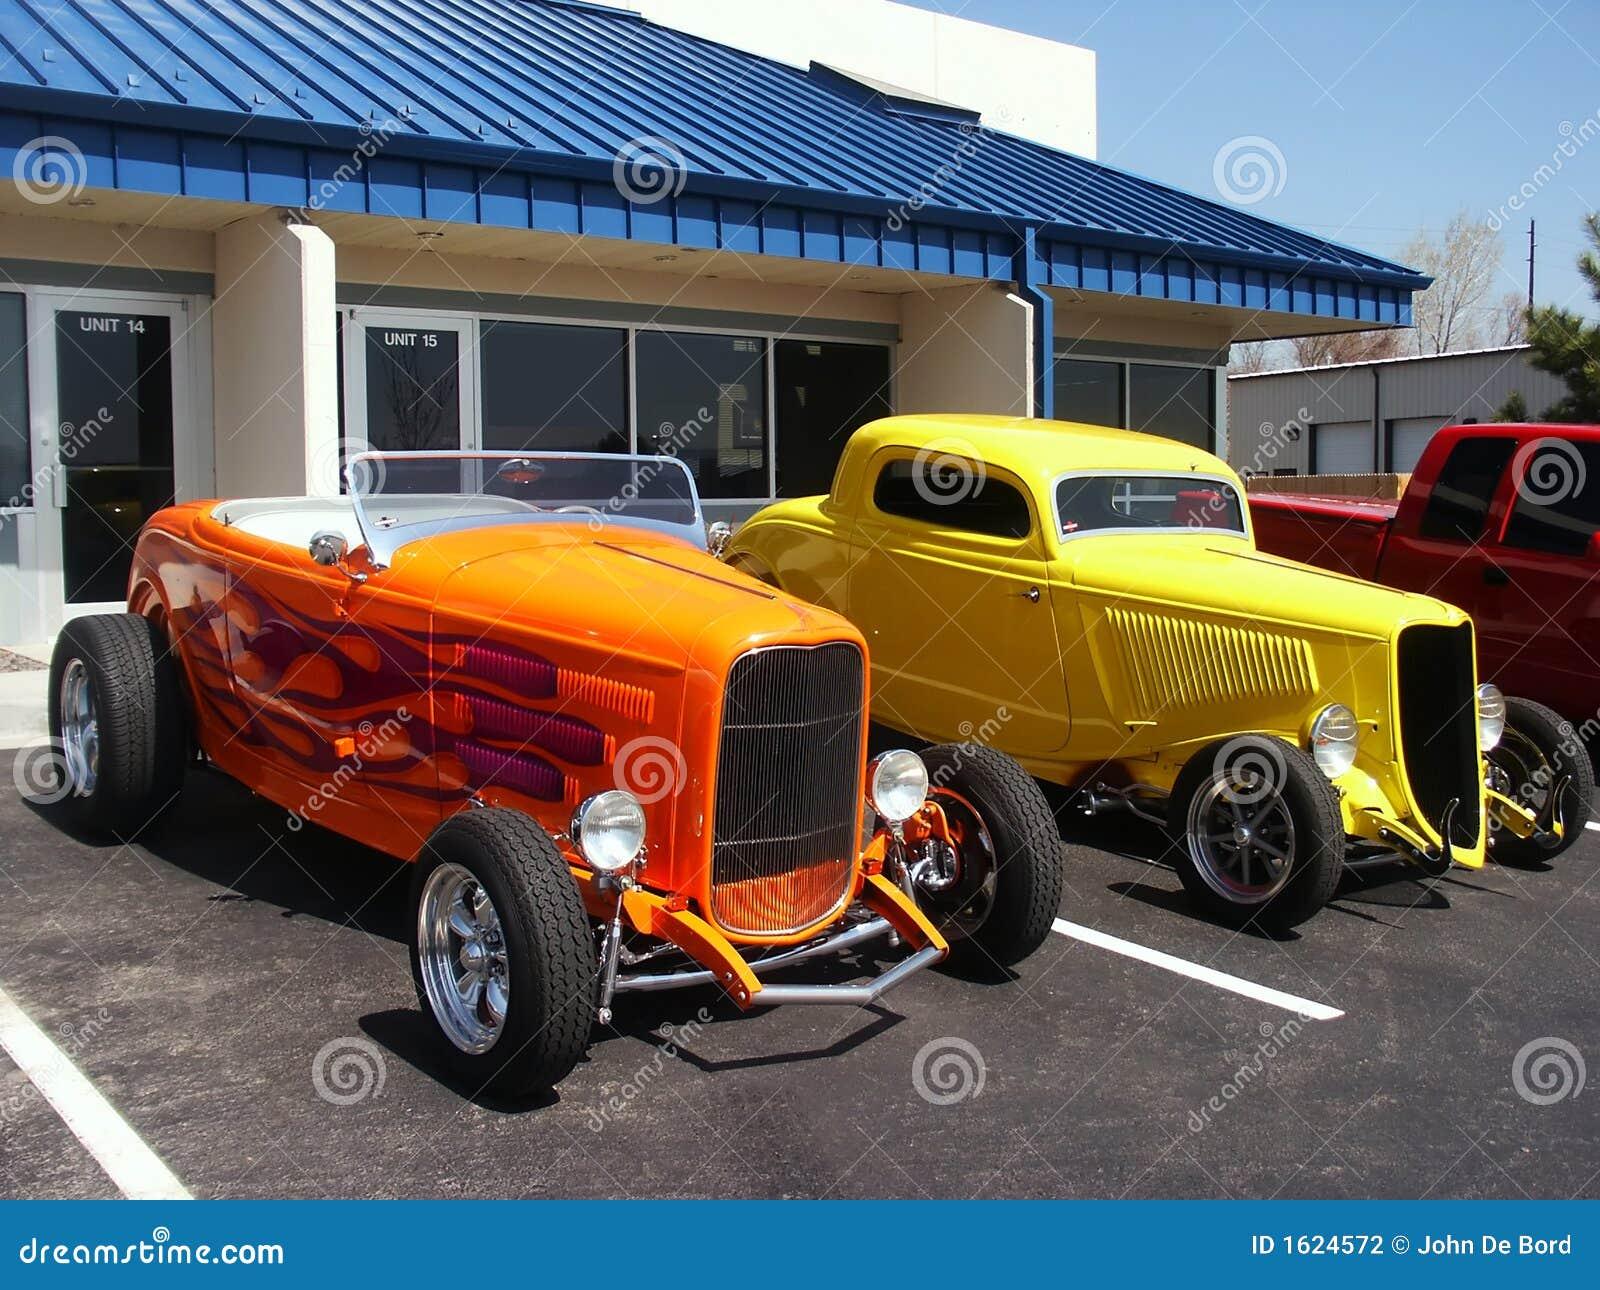 Hotrod Cars Stock Photography - Image: 1624572